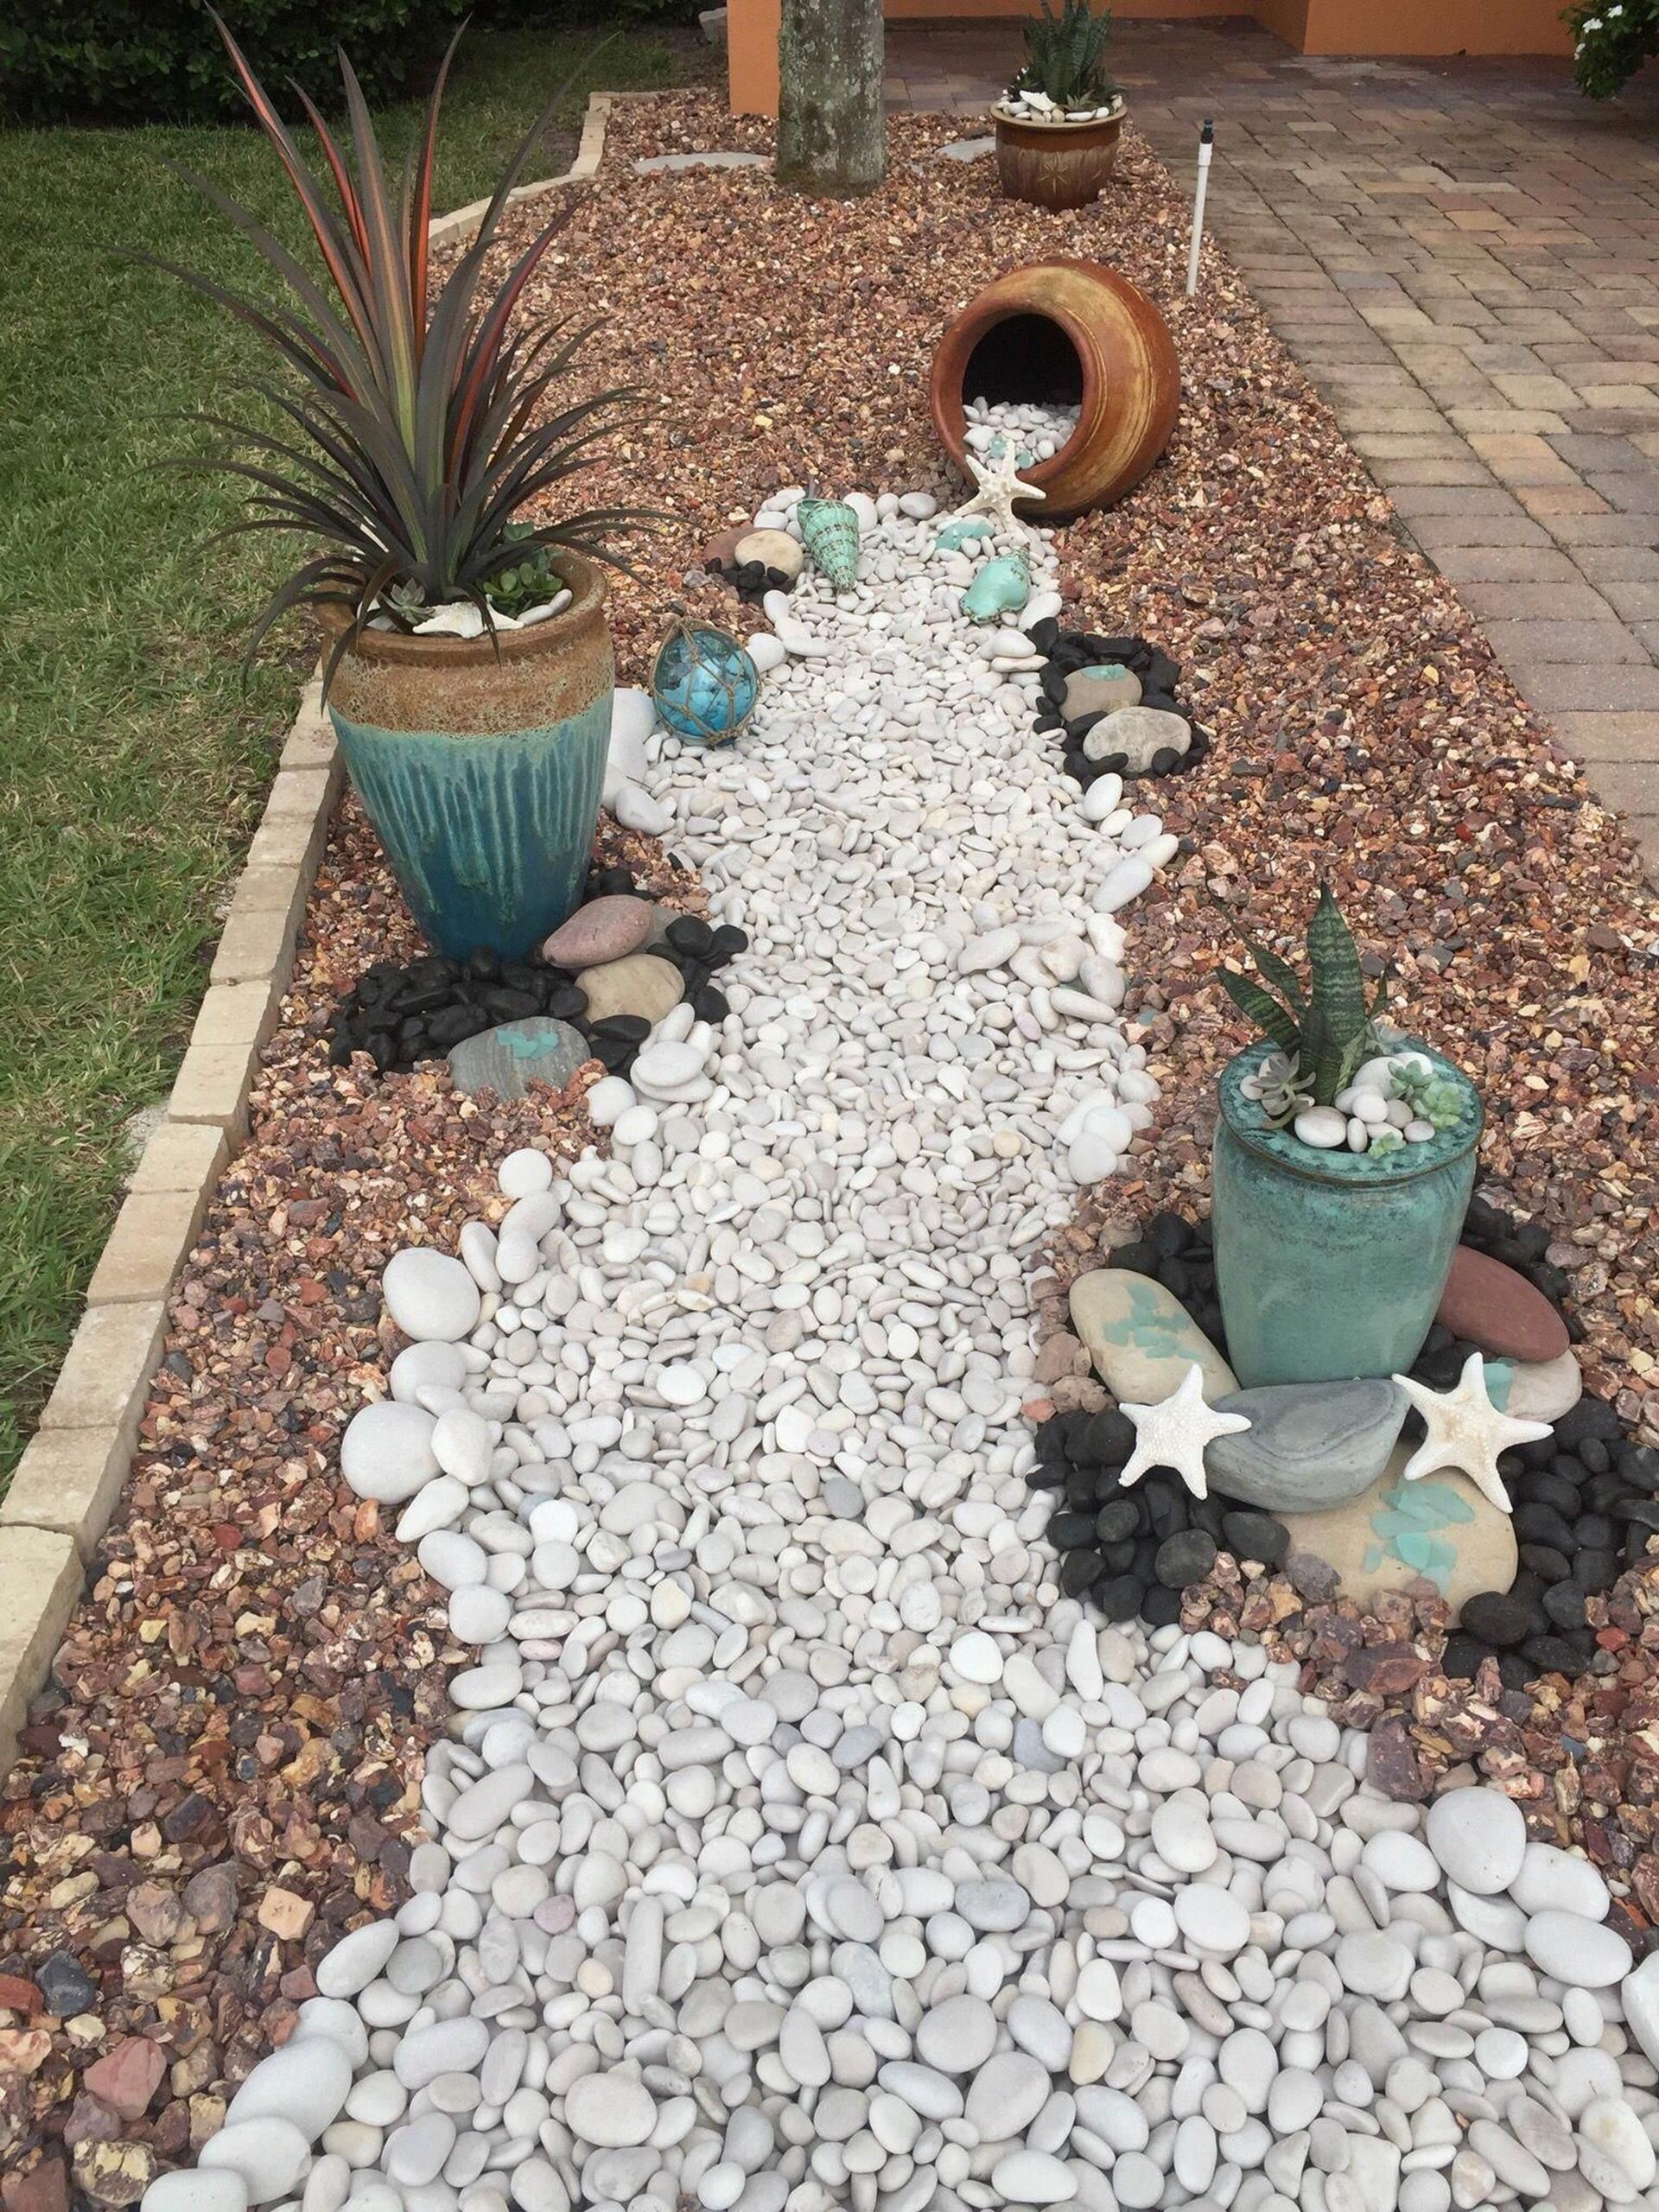 White Rocks Spilled From Jar Decoist In 2021 Landscaping With Rocks Rock Garden Design Garden Landscape Design